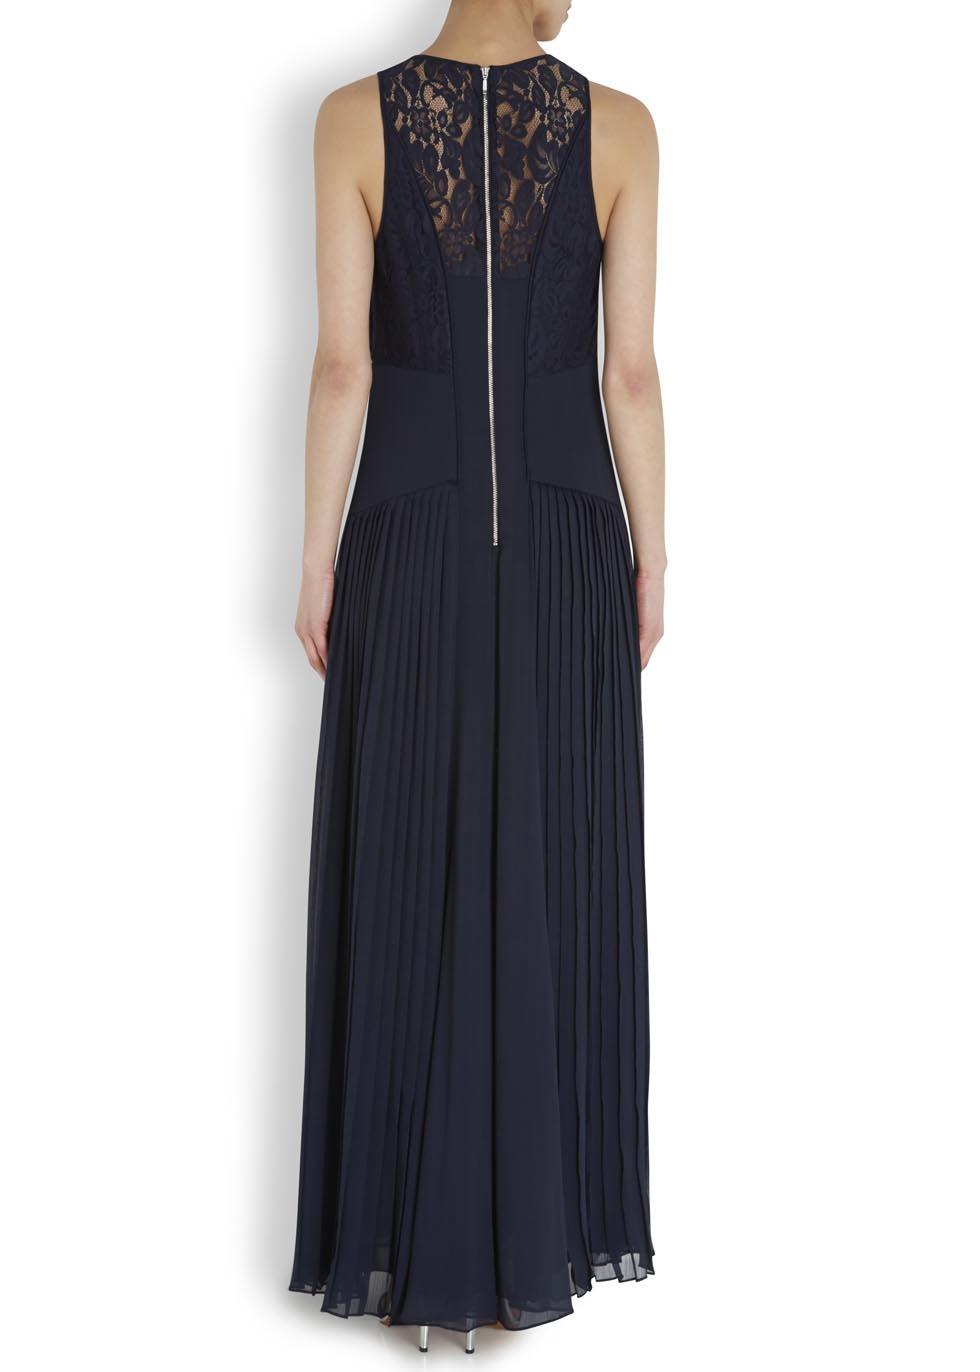 Whistles navy maxi dress